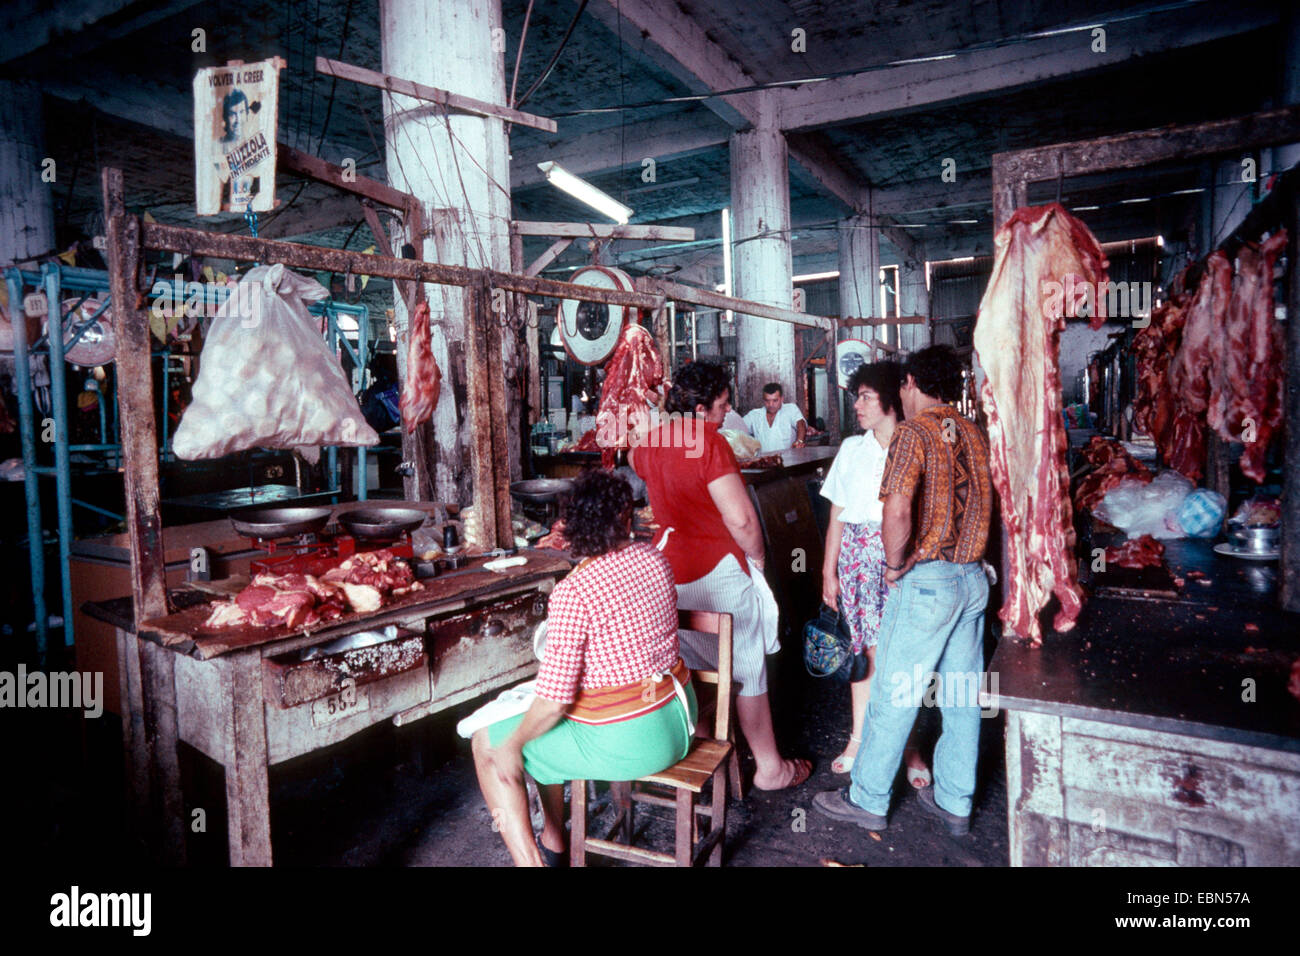 meat market, Paraguay, Asuncion - Stock Image